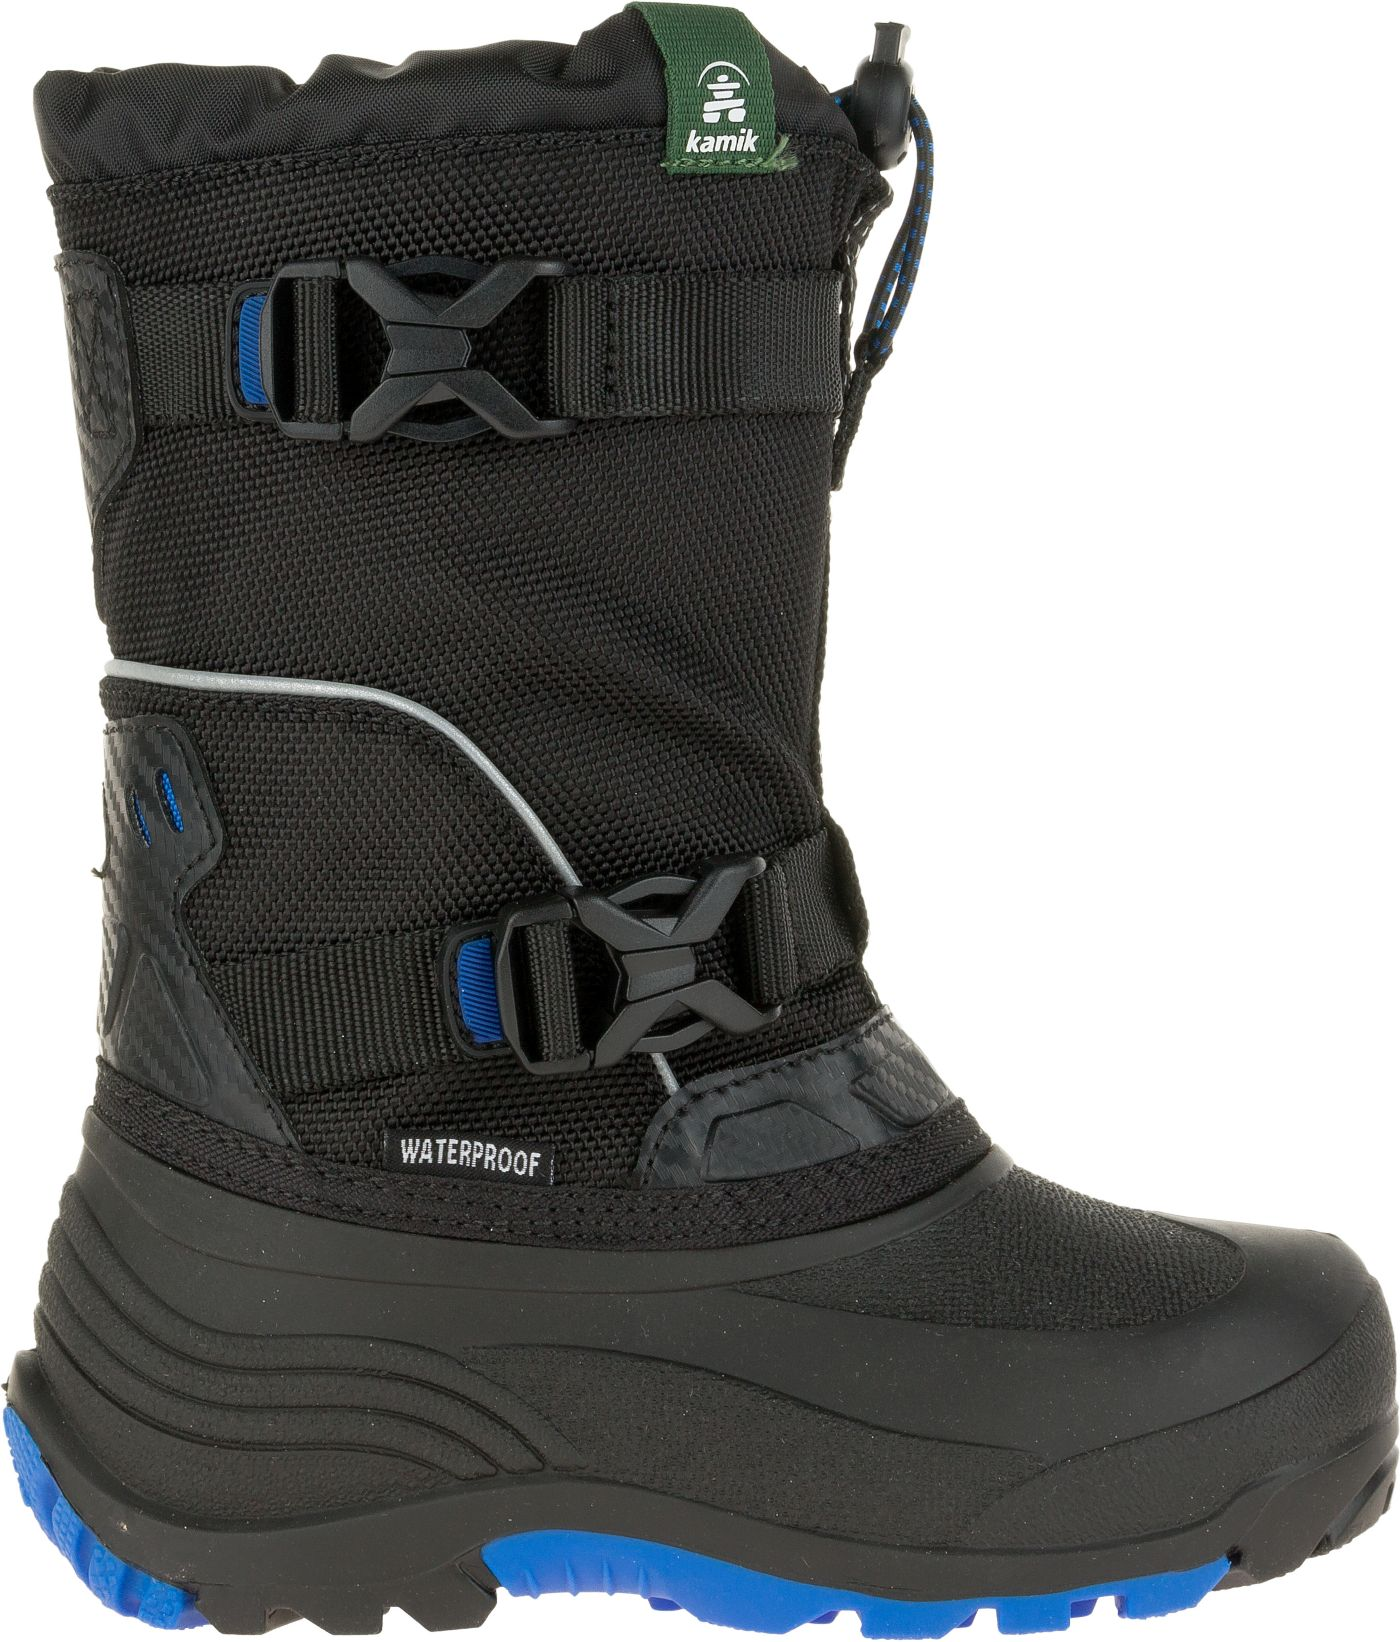 Kamik Kids' Glacial2 Insulated Waterproof Winter Boots